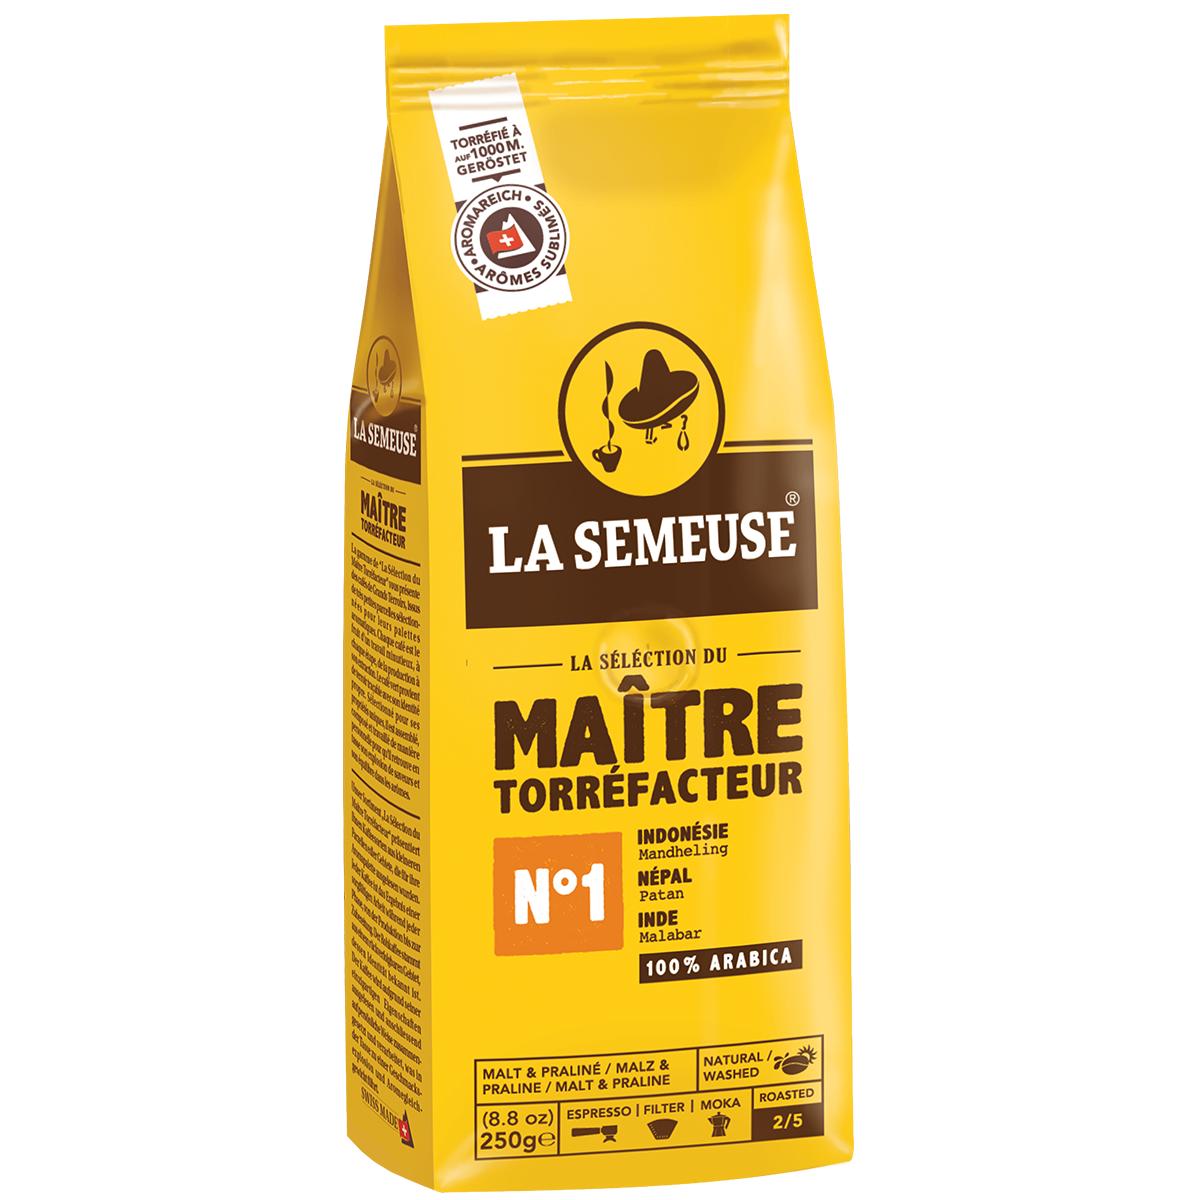 Best Kitten Food 2020 La Semeuse   SMT N°1 Swiss High Altitude Coffee Beans, Premium